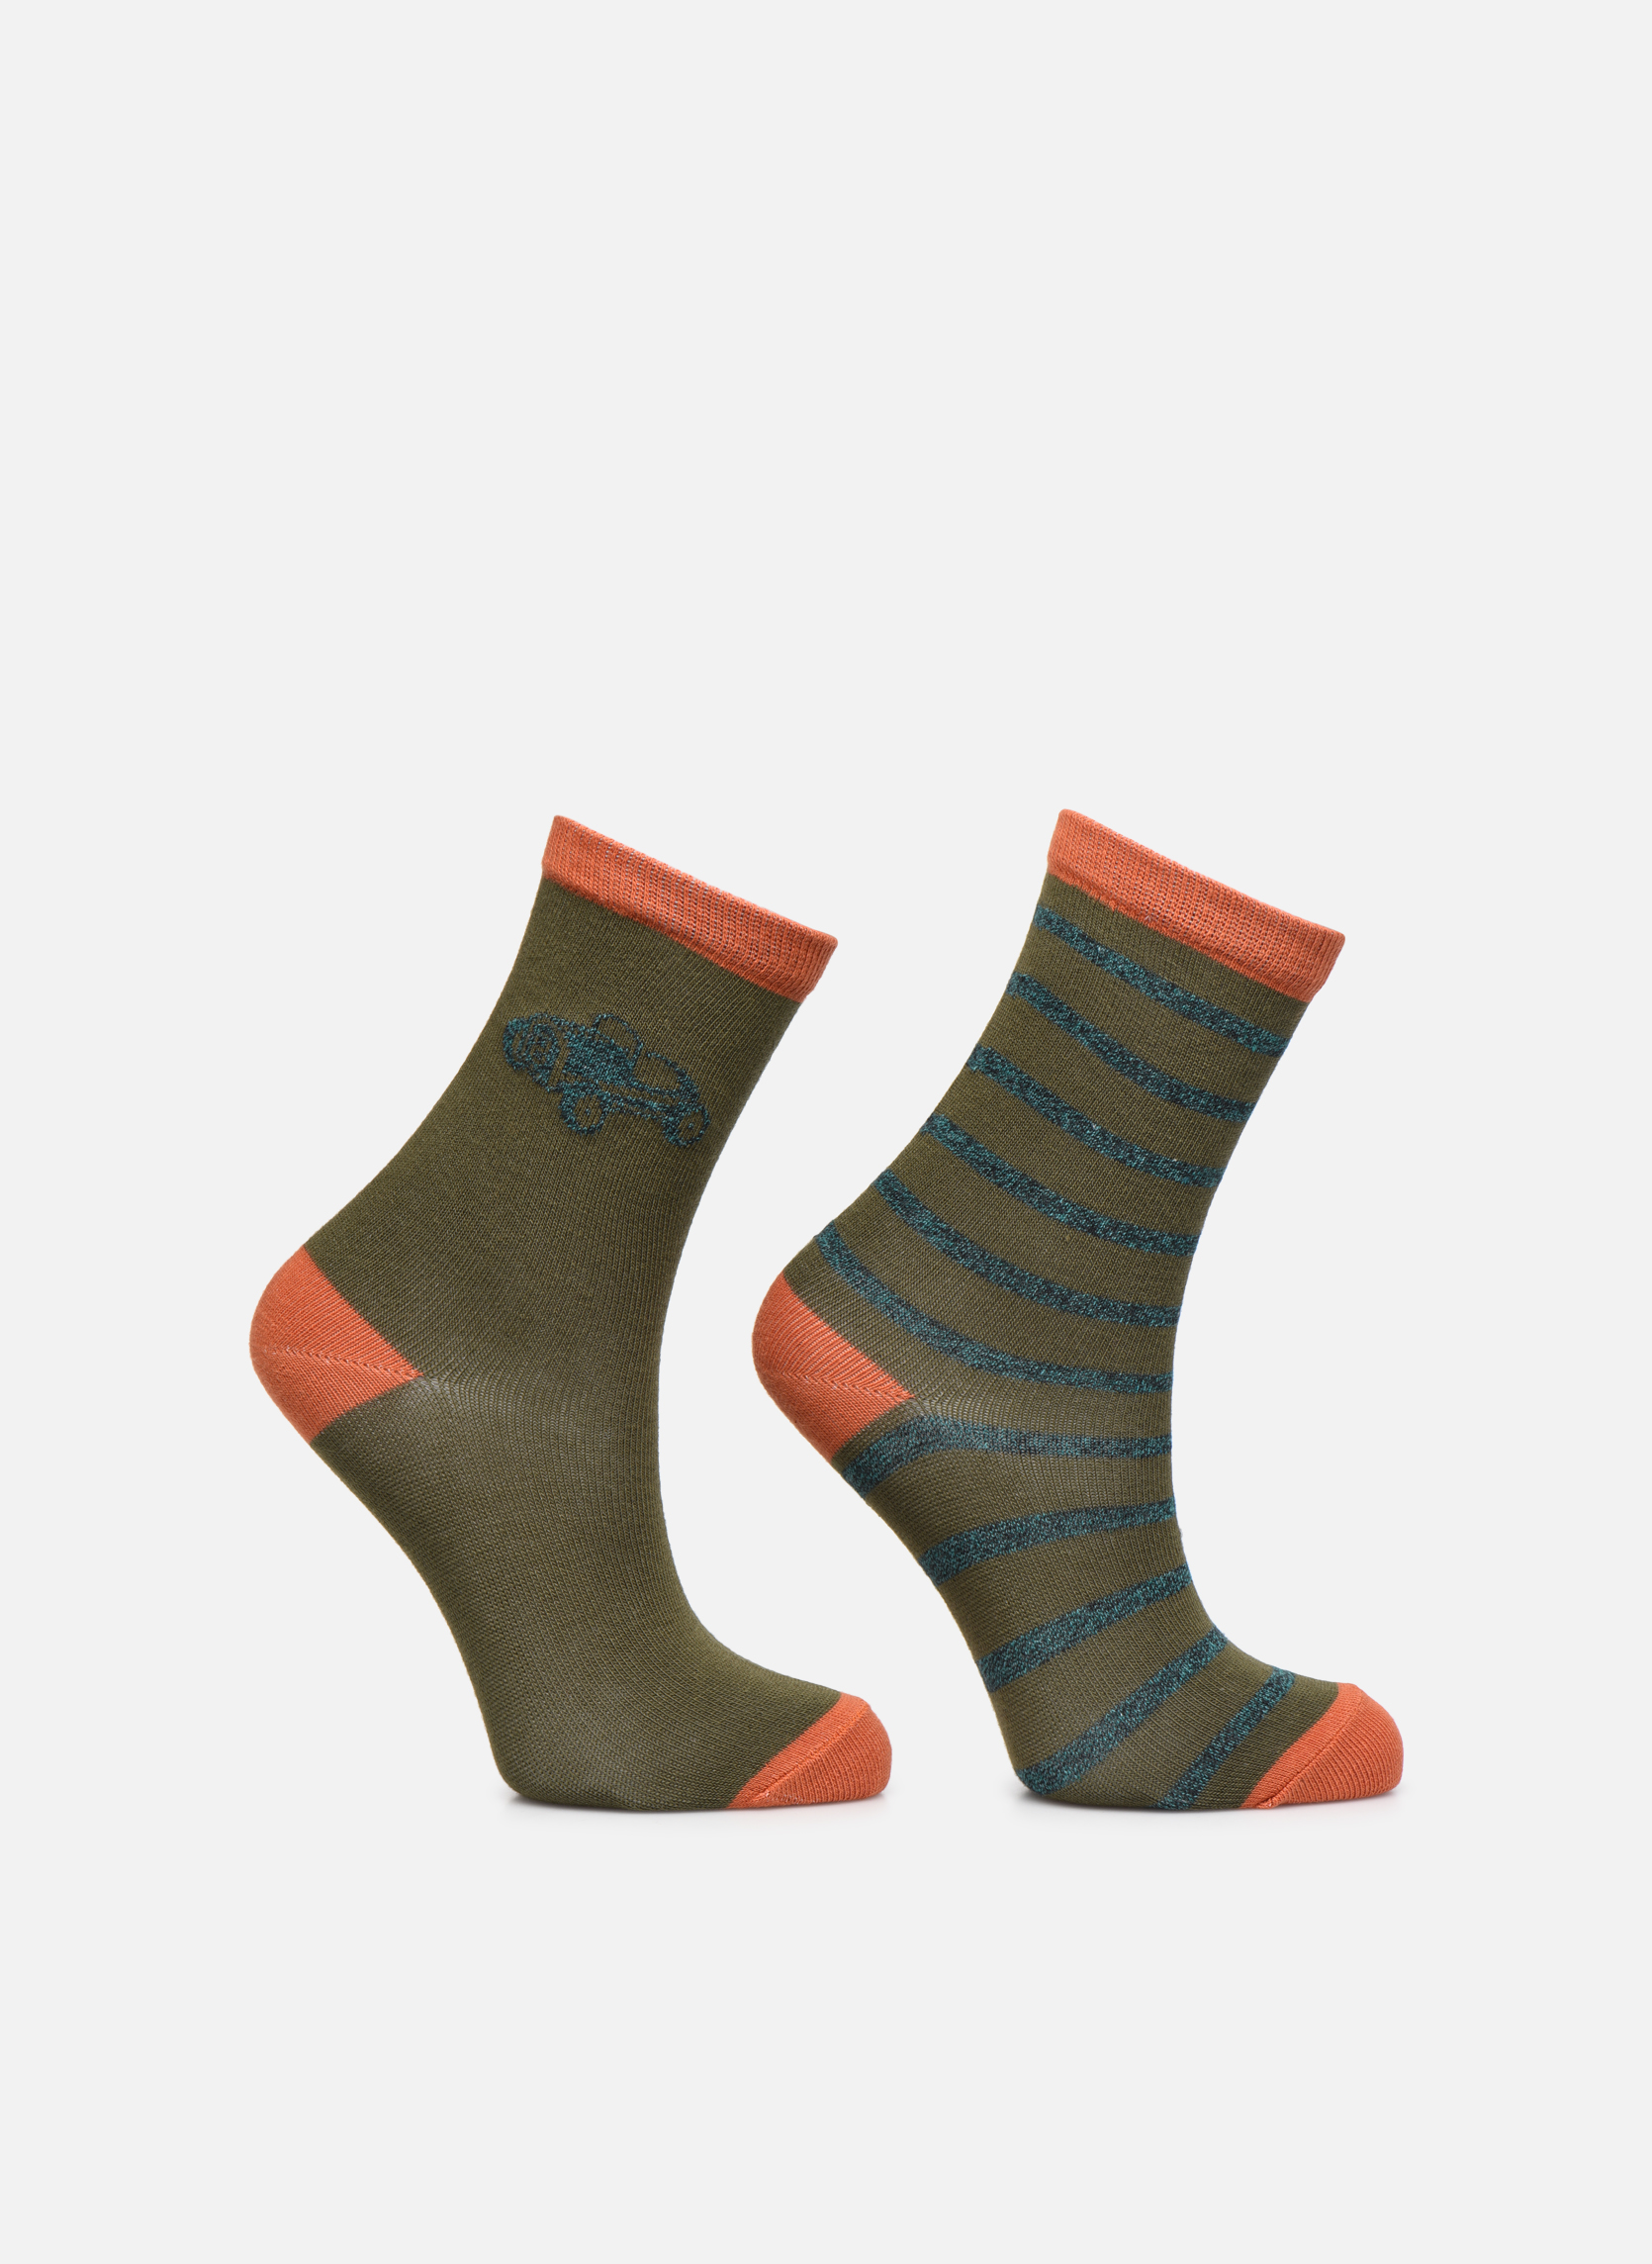 Socks Fantaisie Pack of 2